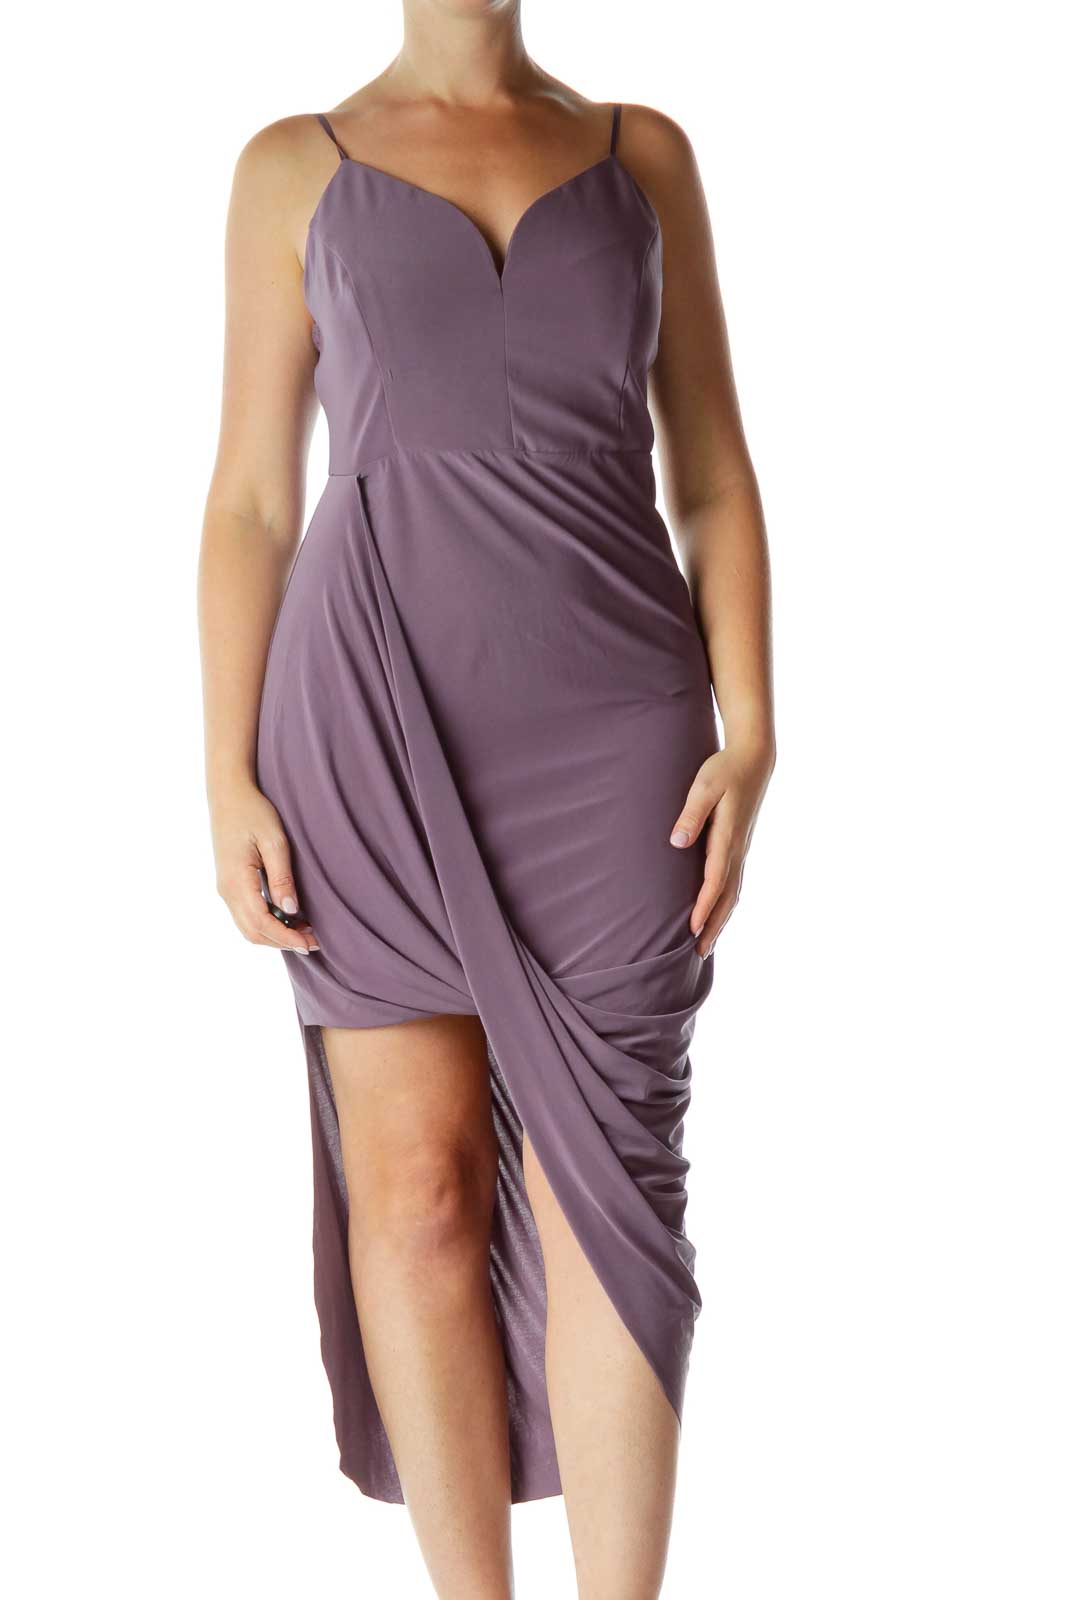 Purple Asymmetric Dress Front